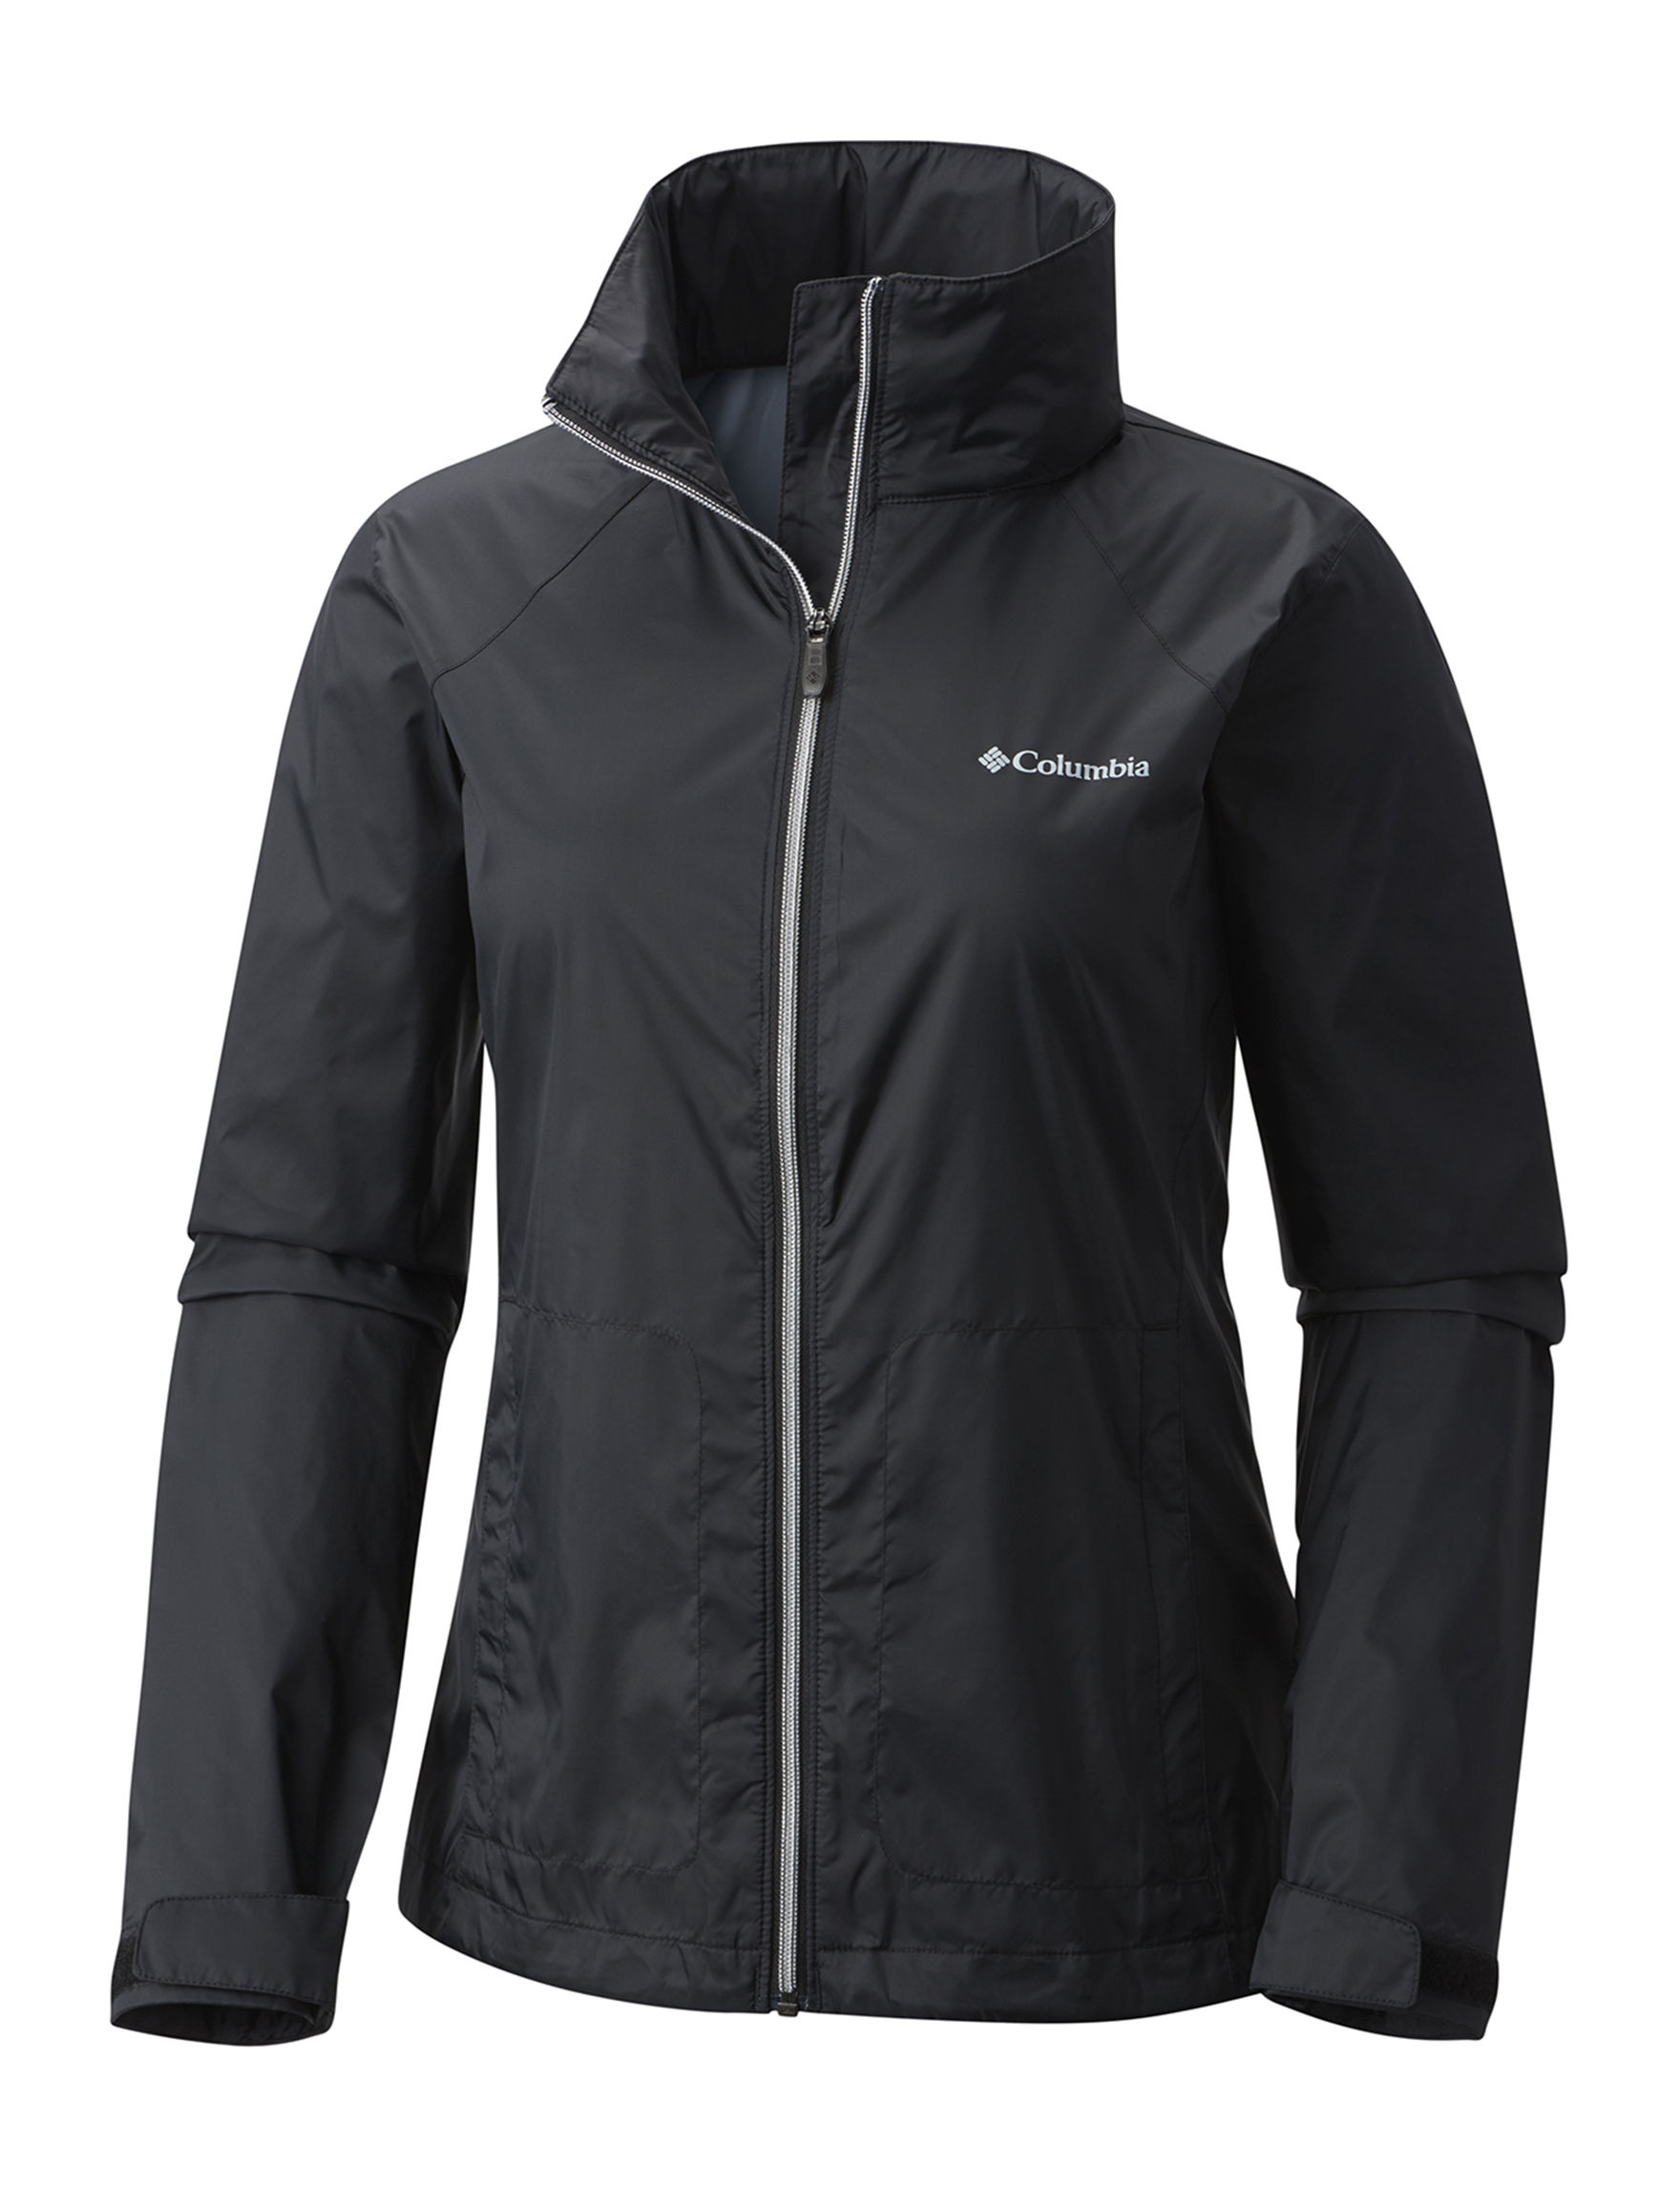 Columbia Black Rain & Snow Jackets